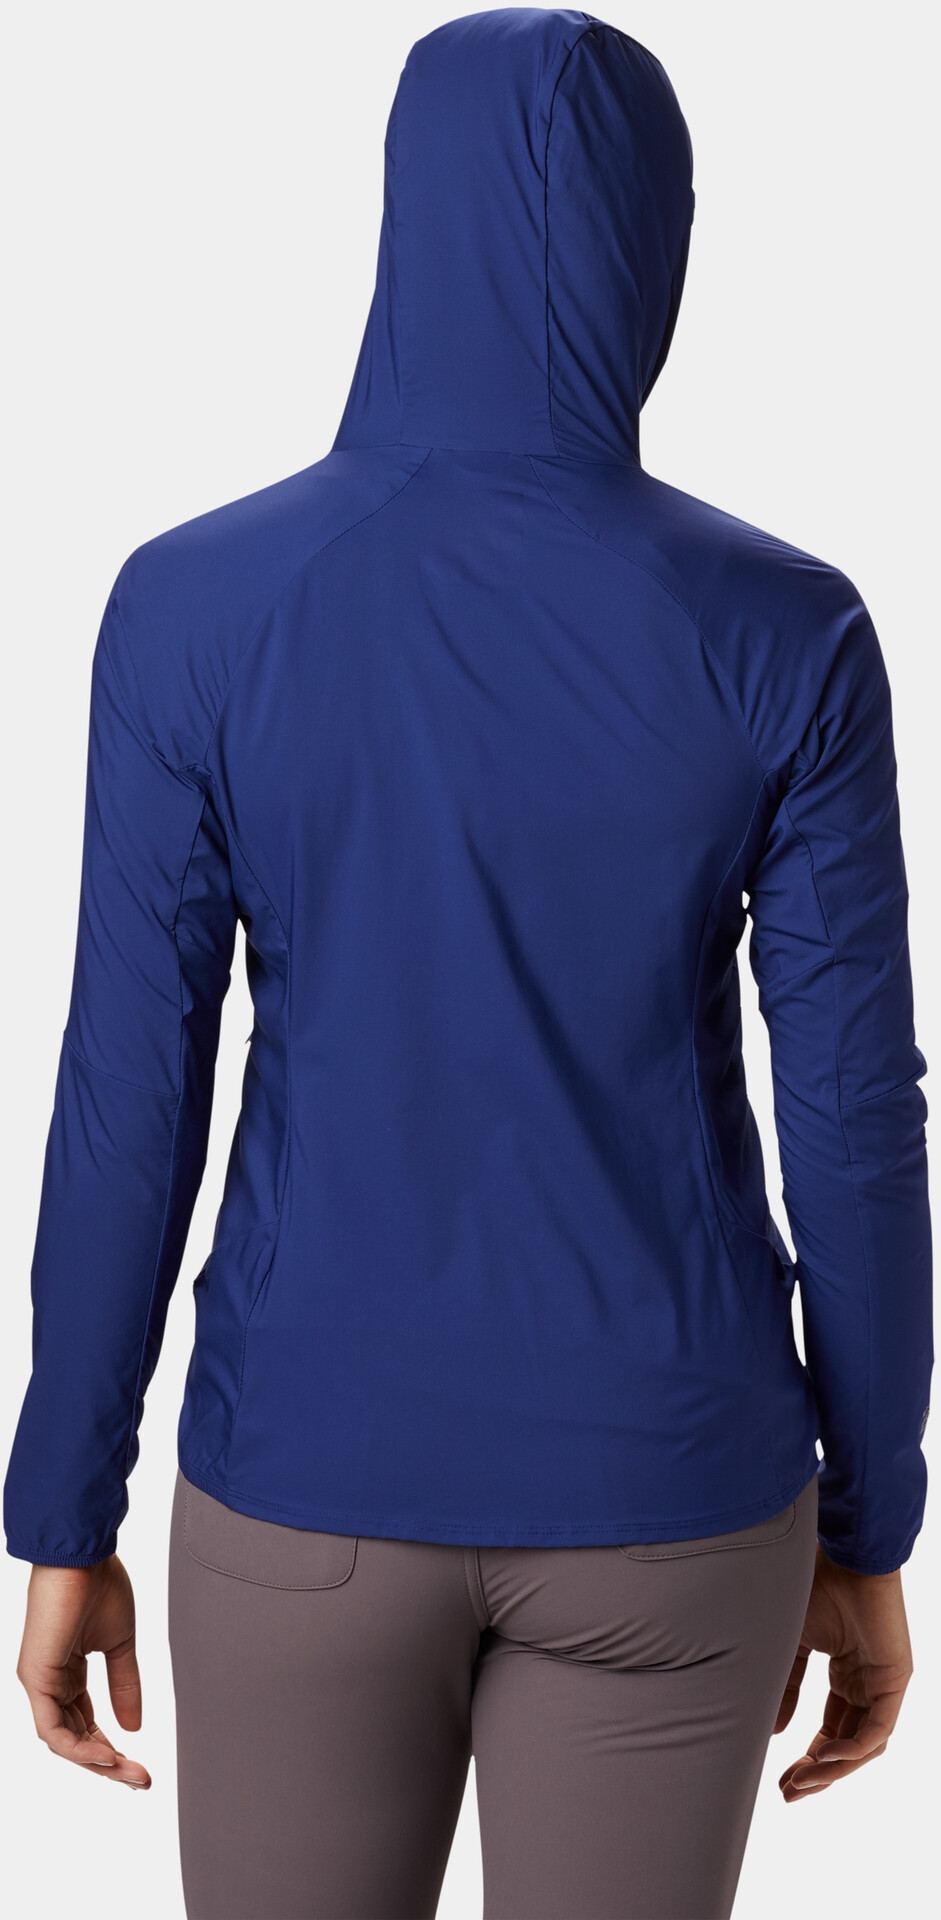 Mountain Hardwear KOR Preshell Chaqueta Mujer Azul 2019